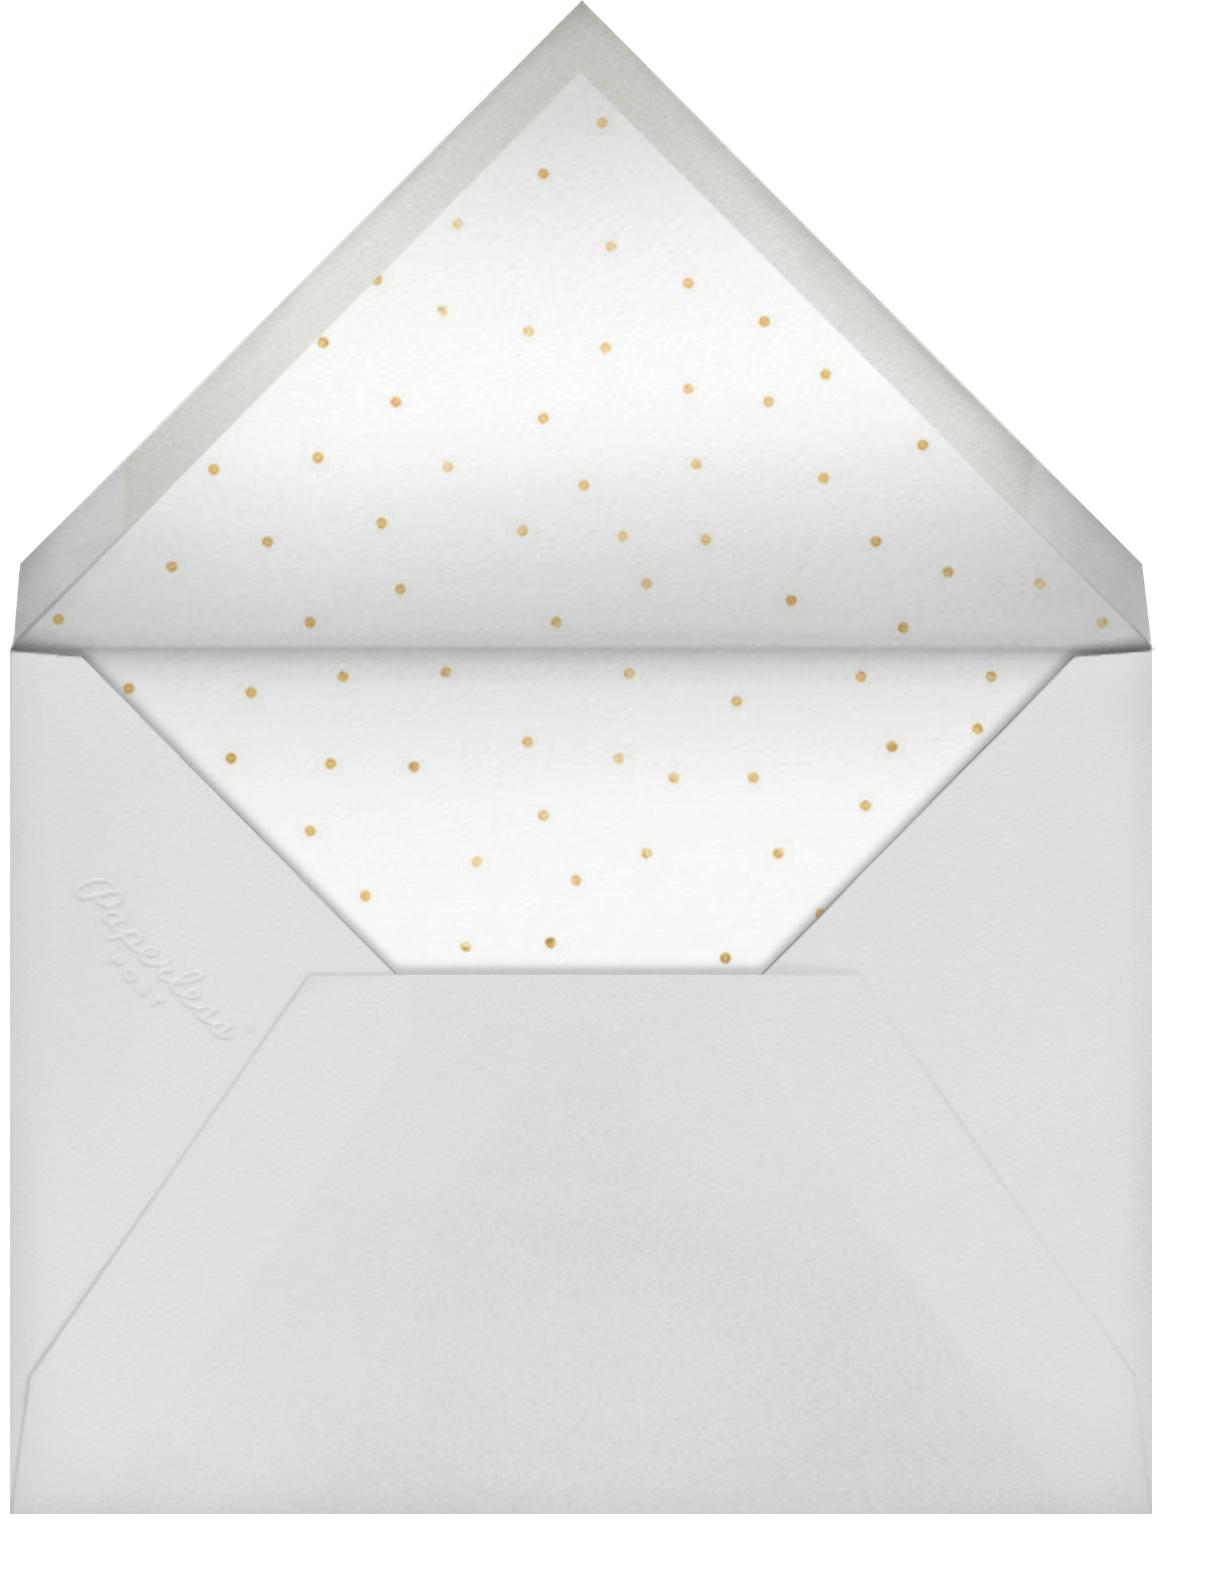 Deck the Halls - Sugar Paper - Christmas party - envelope back